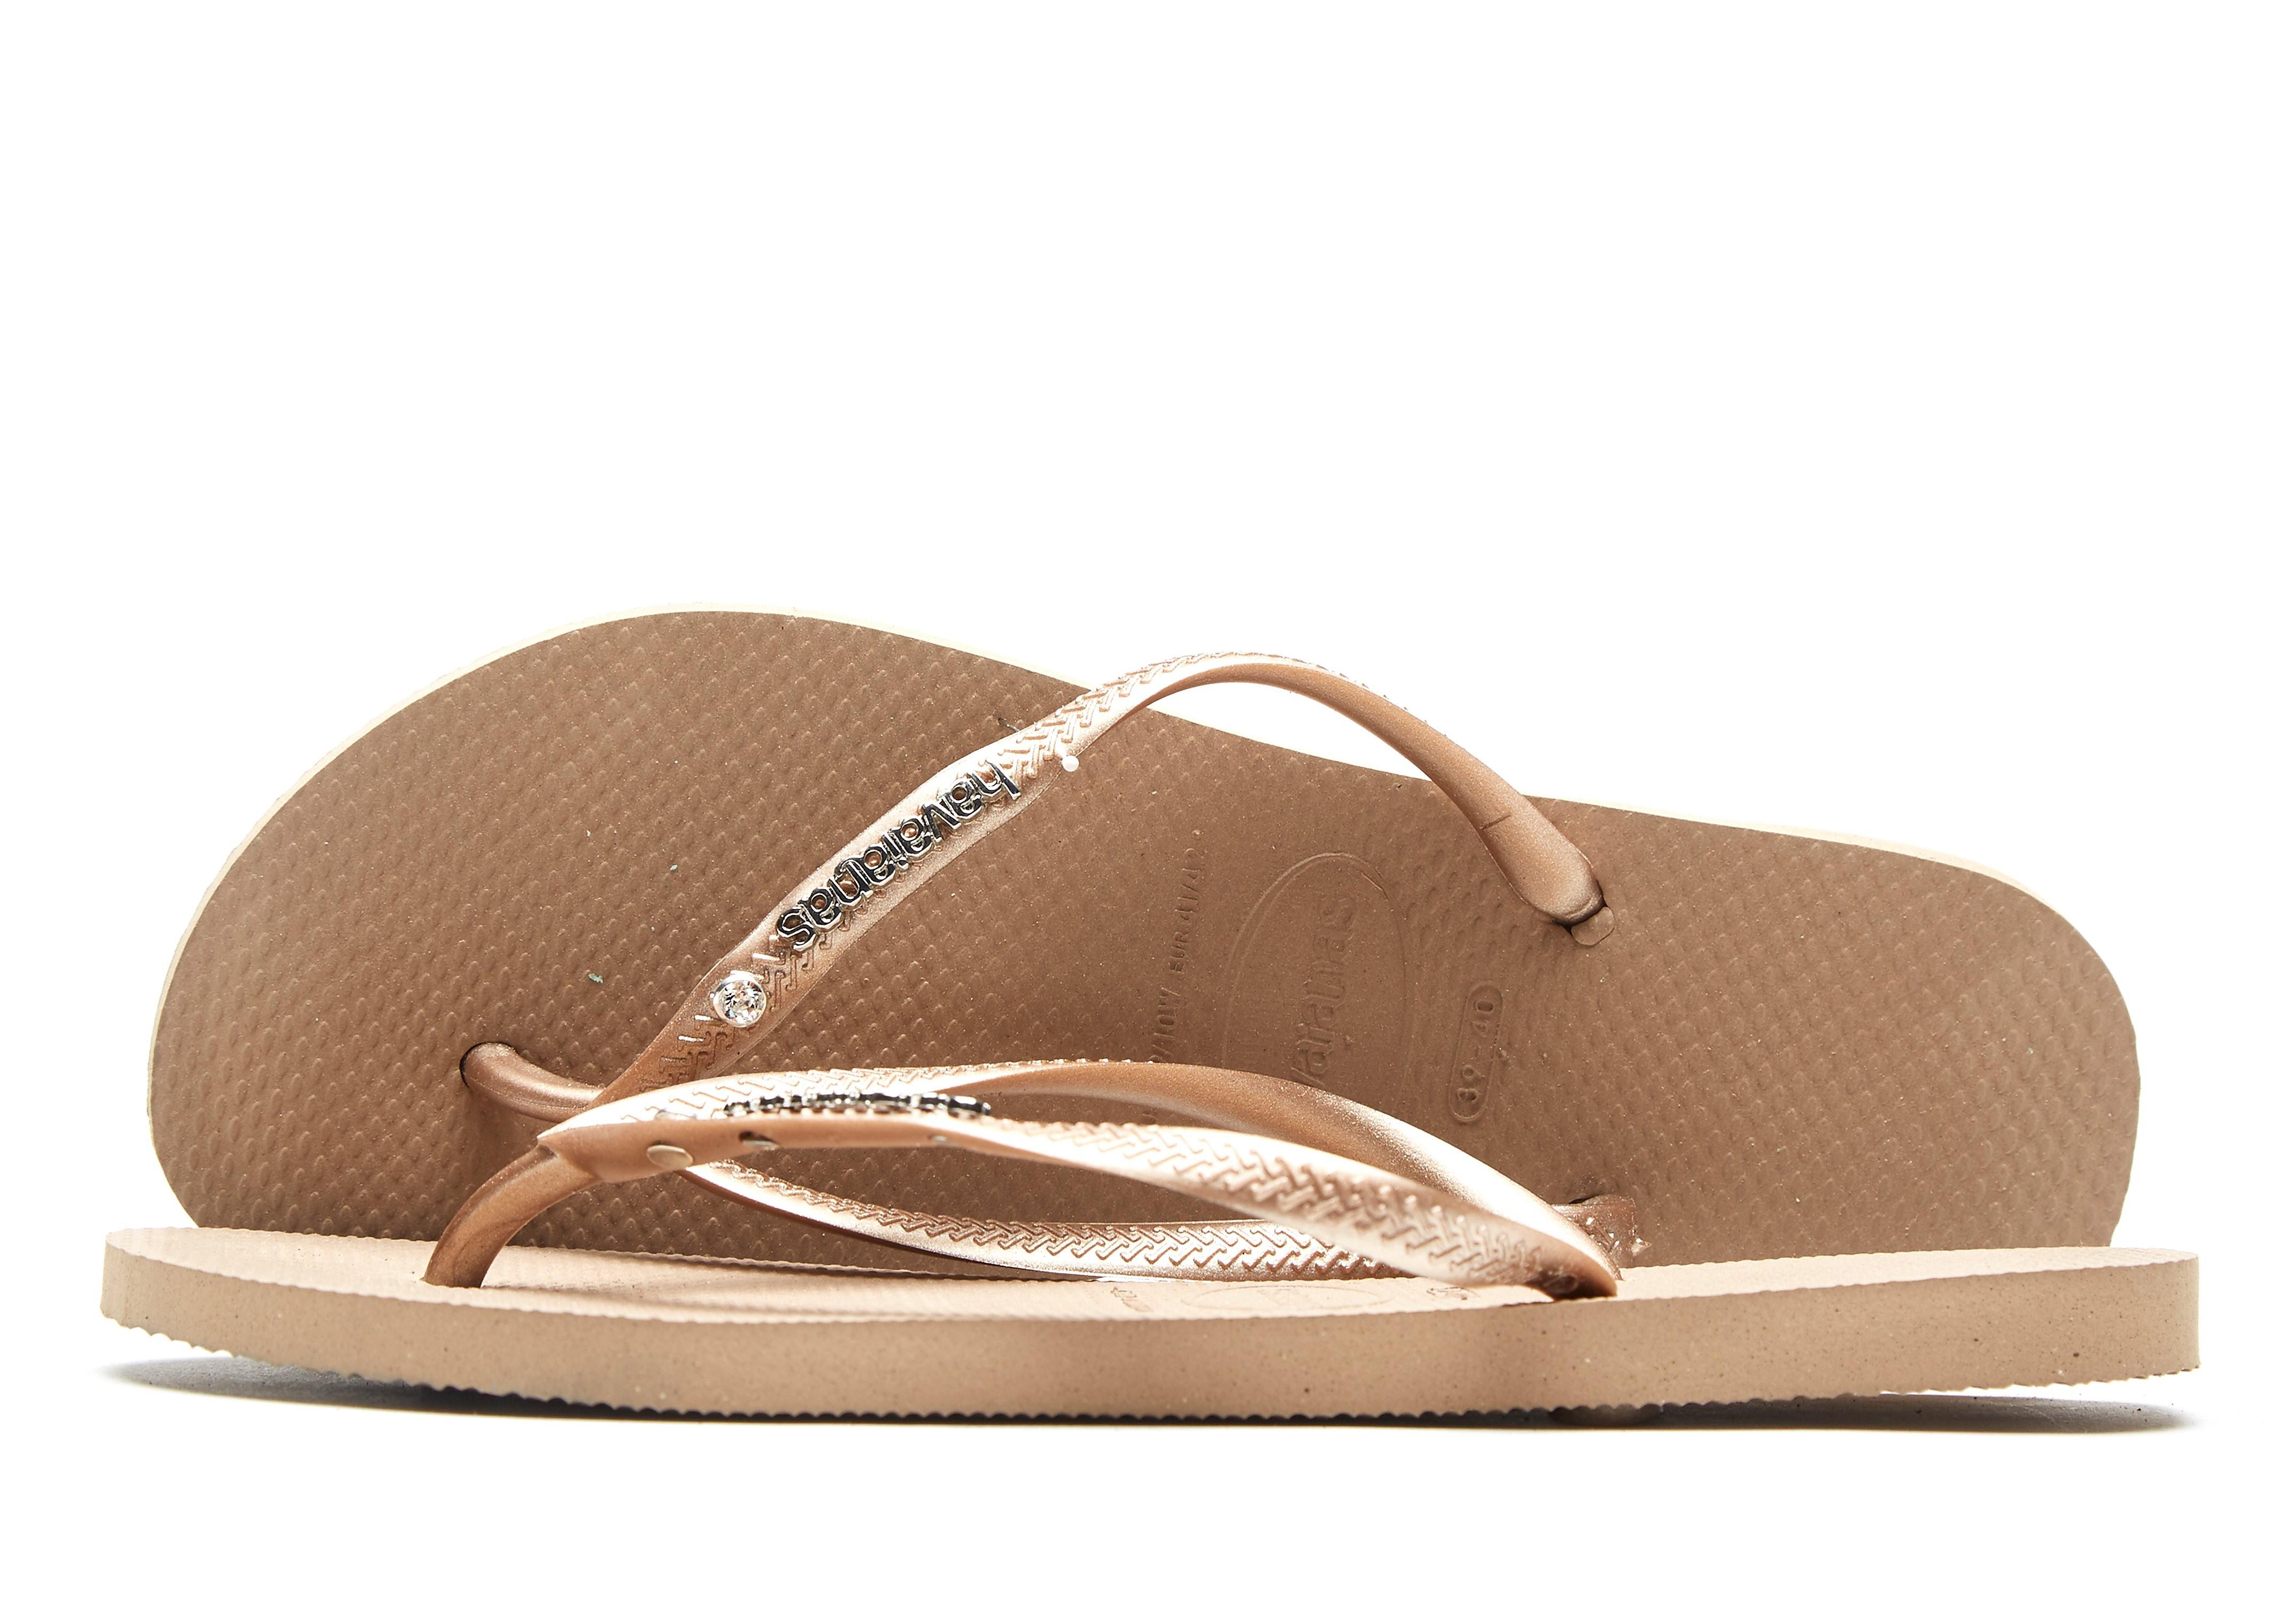 Havaianas Slim Crystal Flip Flops Women's